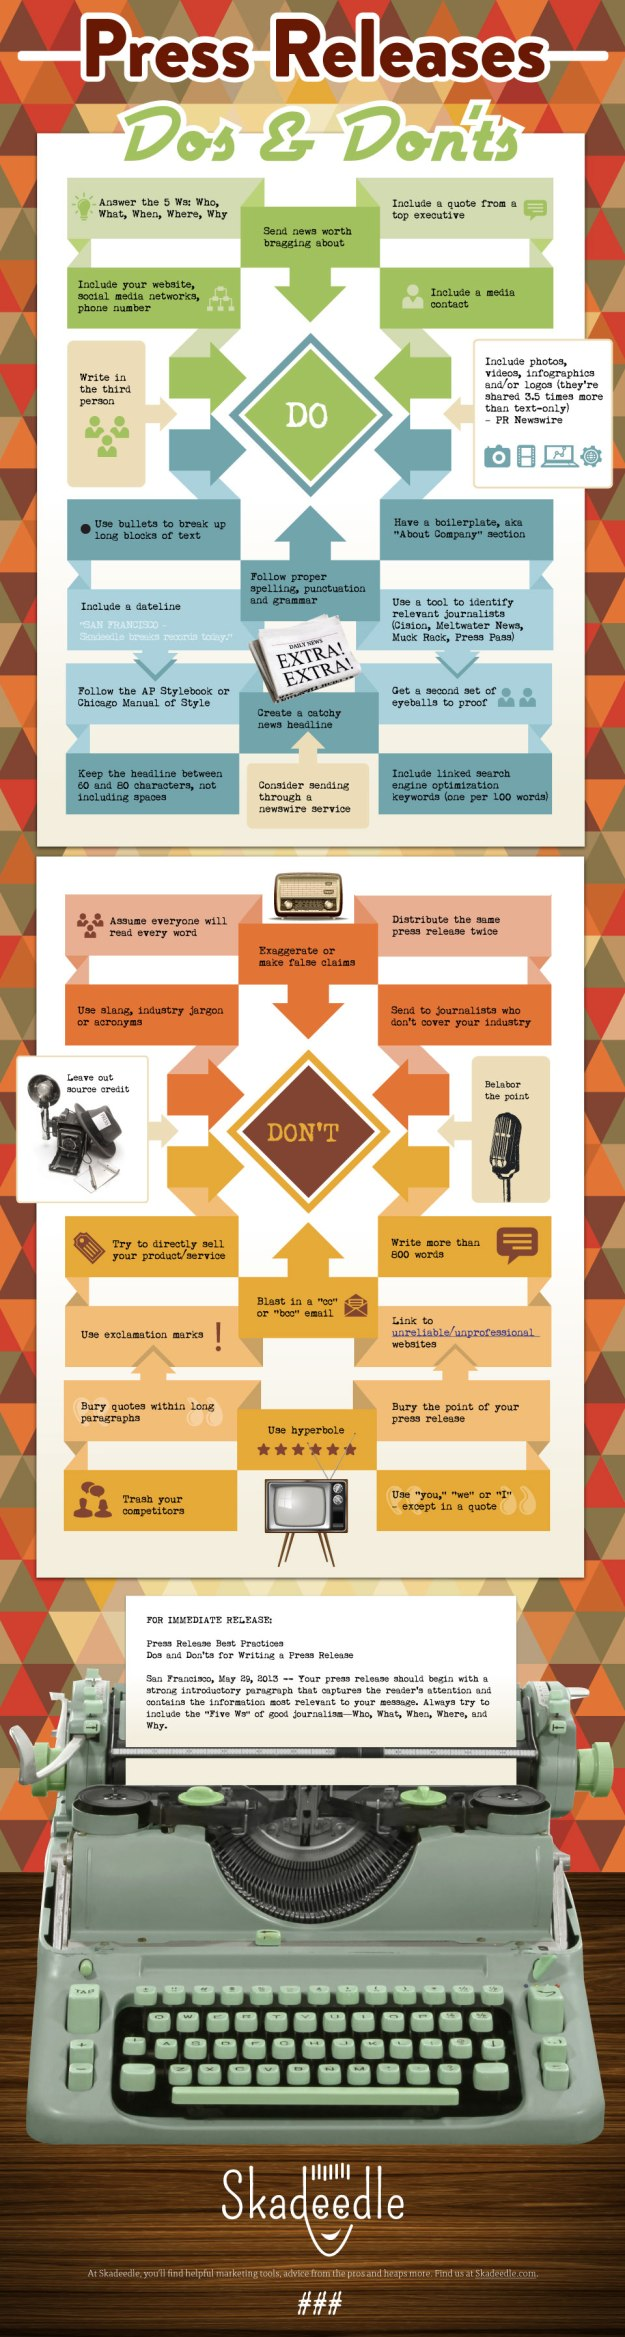 PR-dosanddonts_infographic-2